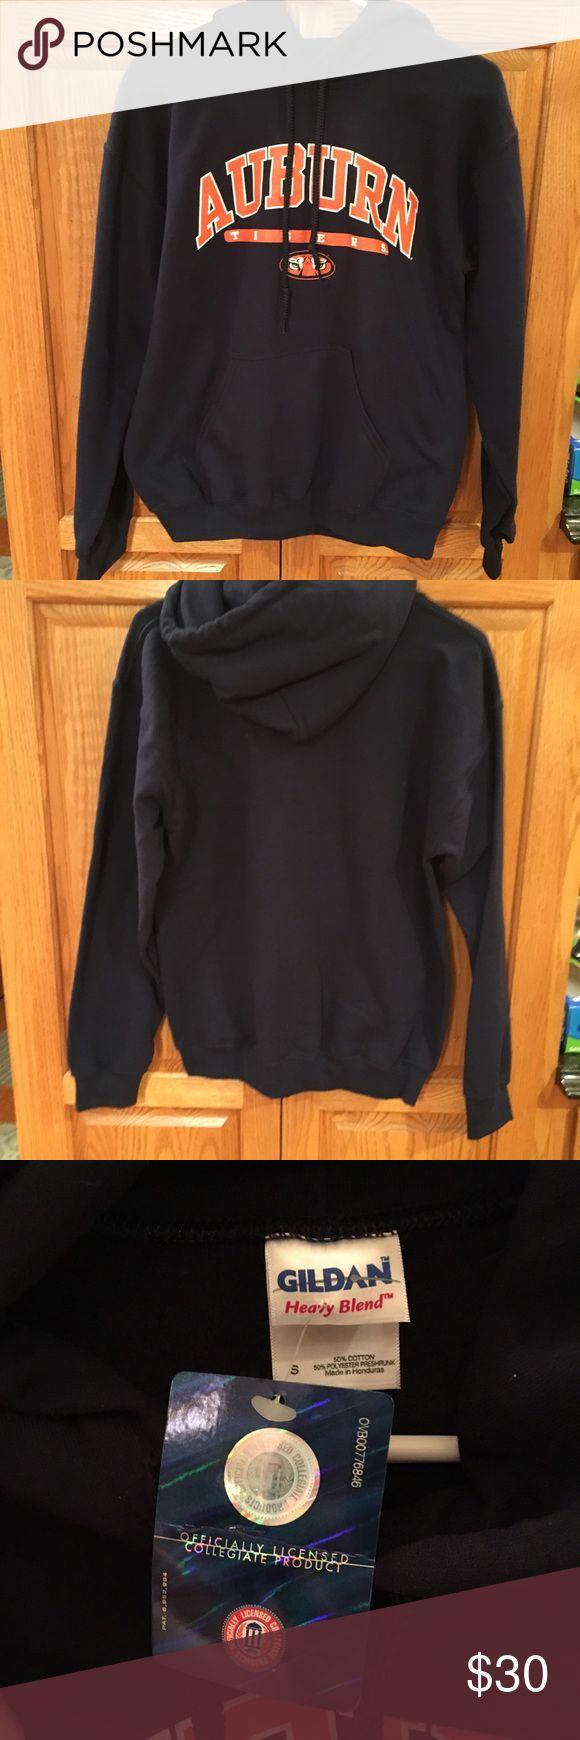 NWT Auburn University Hoodie Size Small NWT Auburn navy hoodie. Size Small. Gildan Tops Sweatshirts & Hoodies